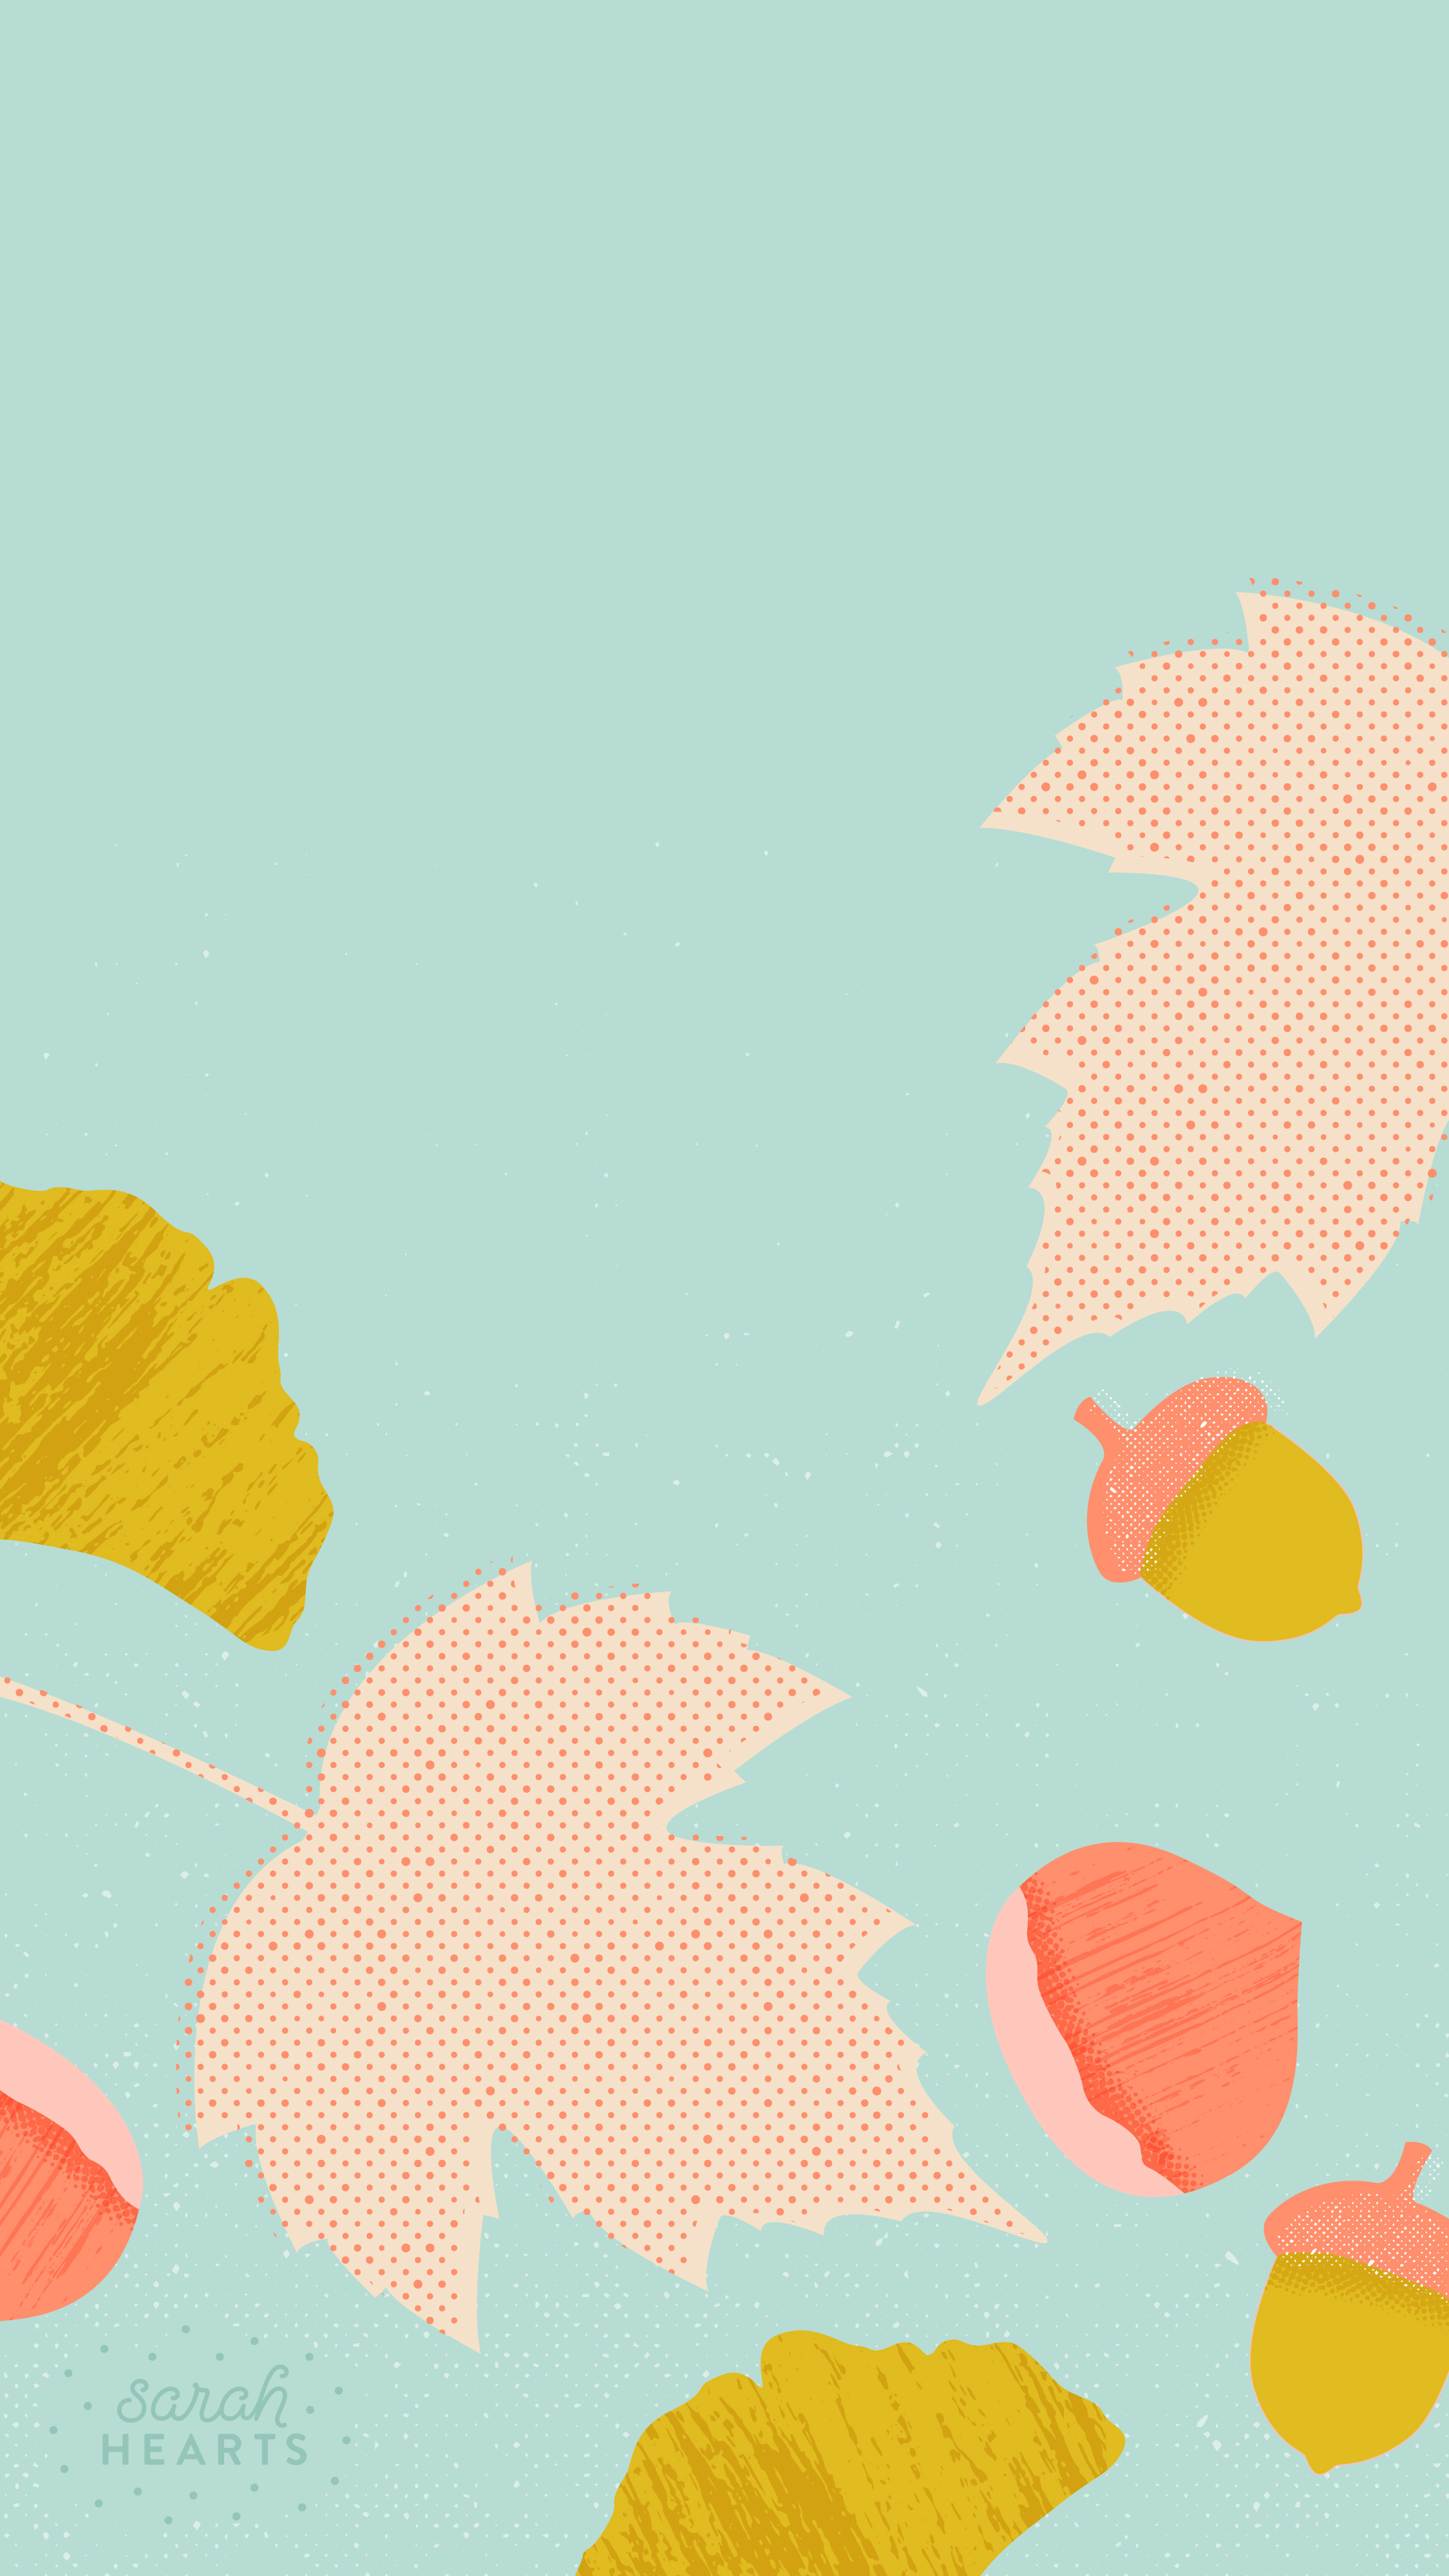 Phone Wallpapers Quotes Hd October 2015 Calendar Wallpaper Sarah Hearts